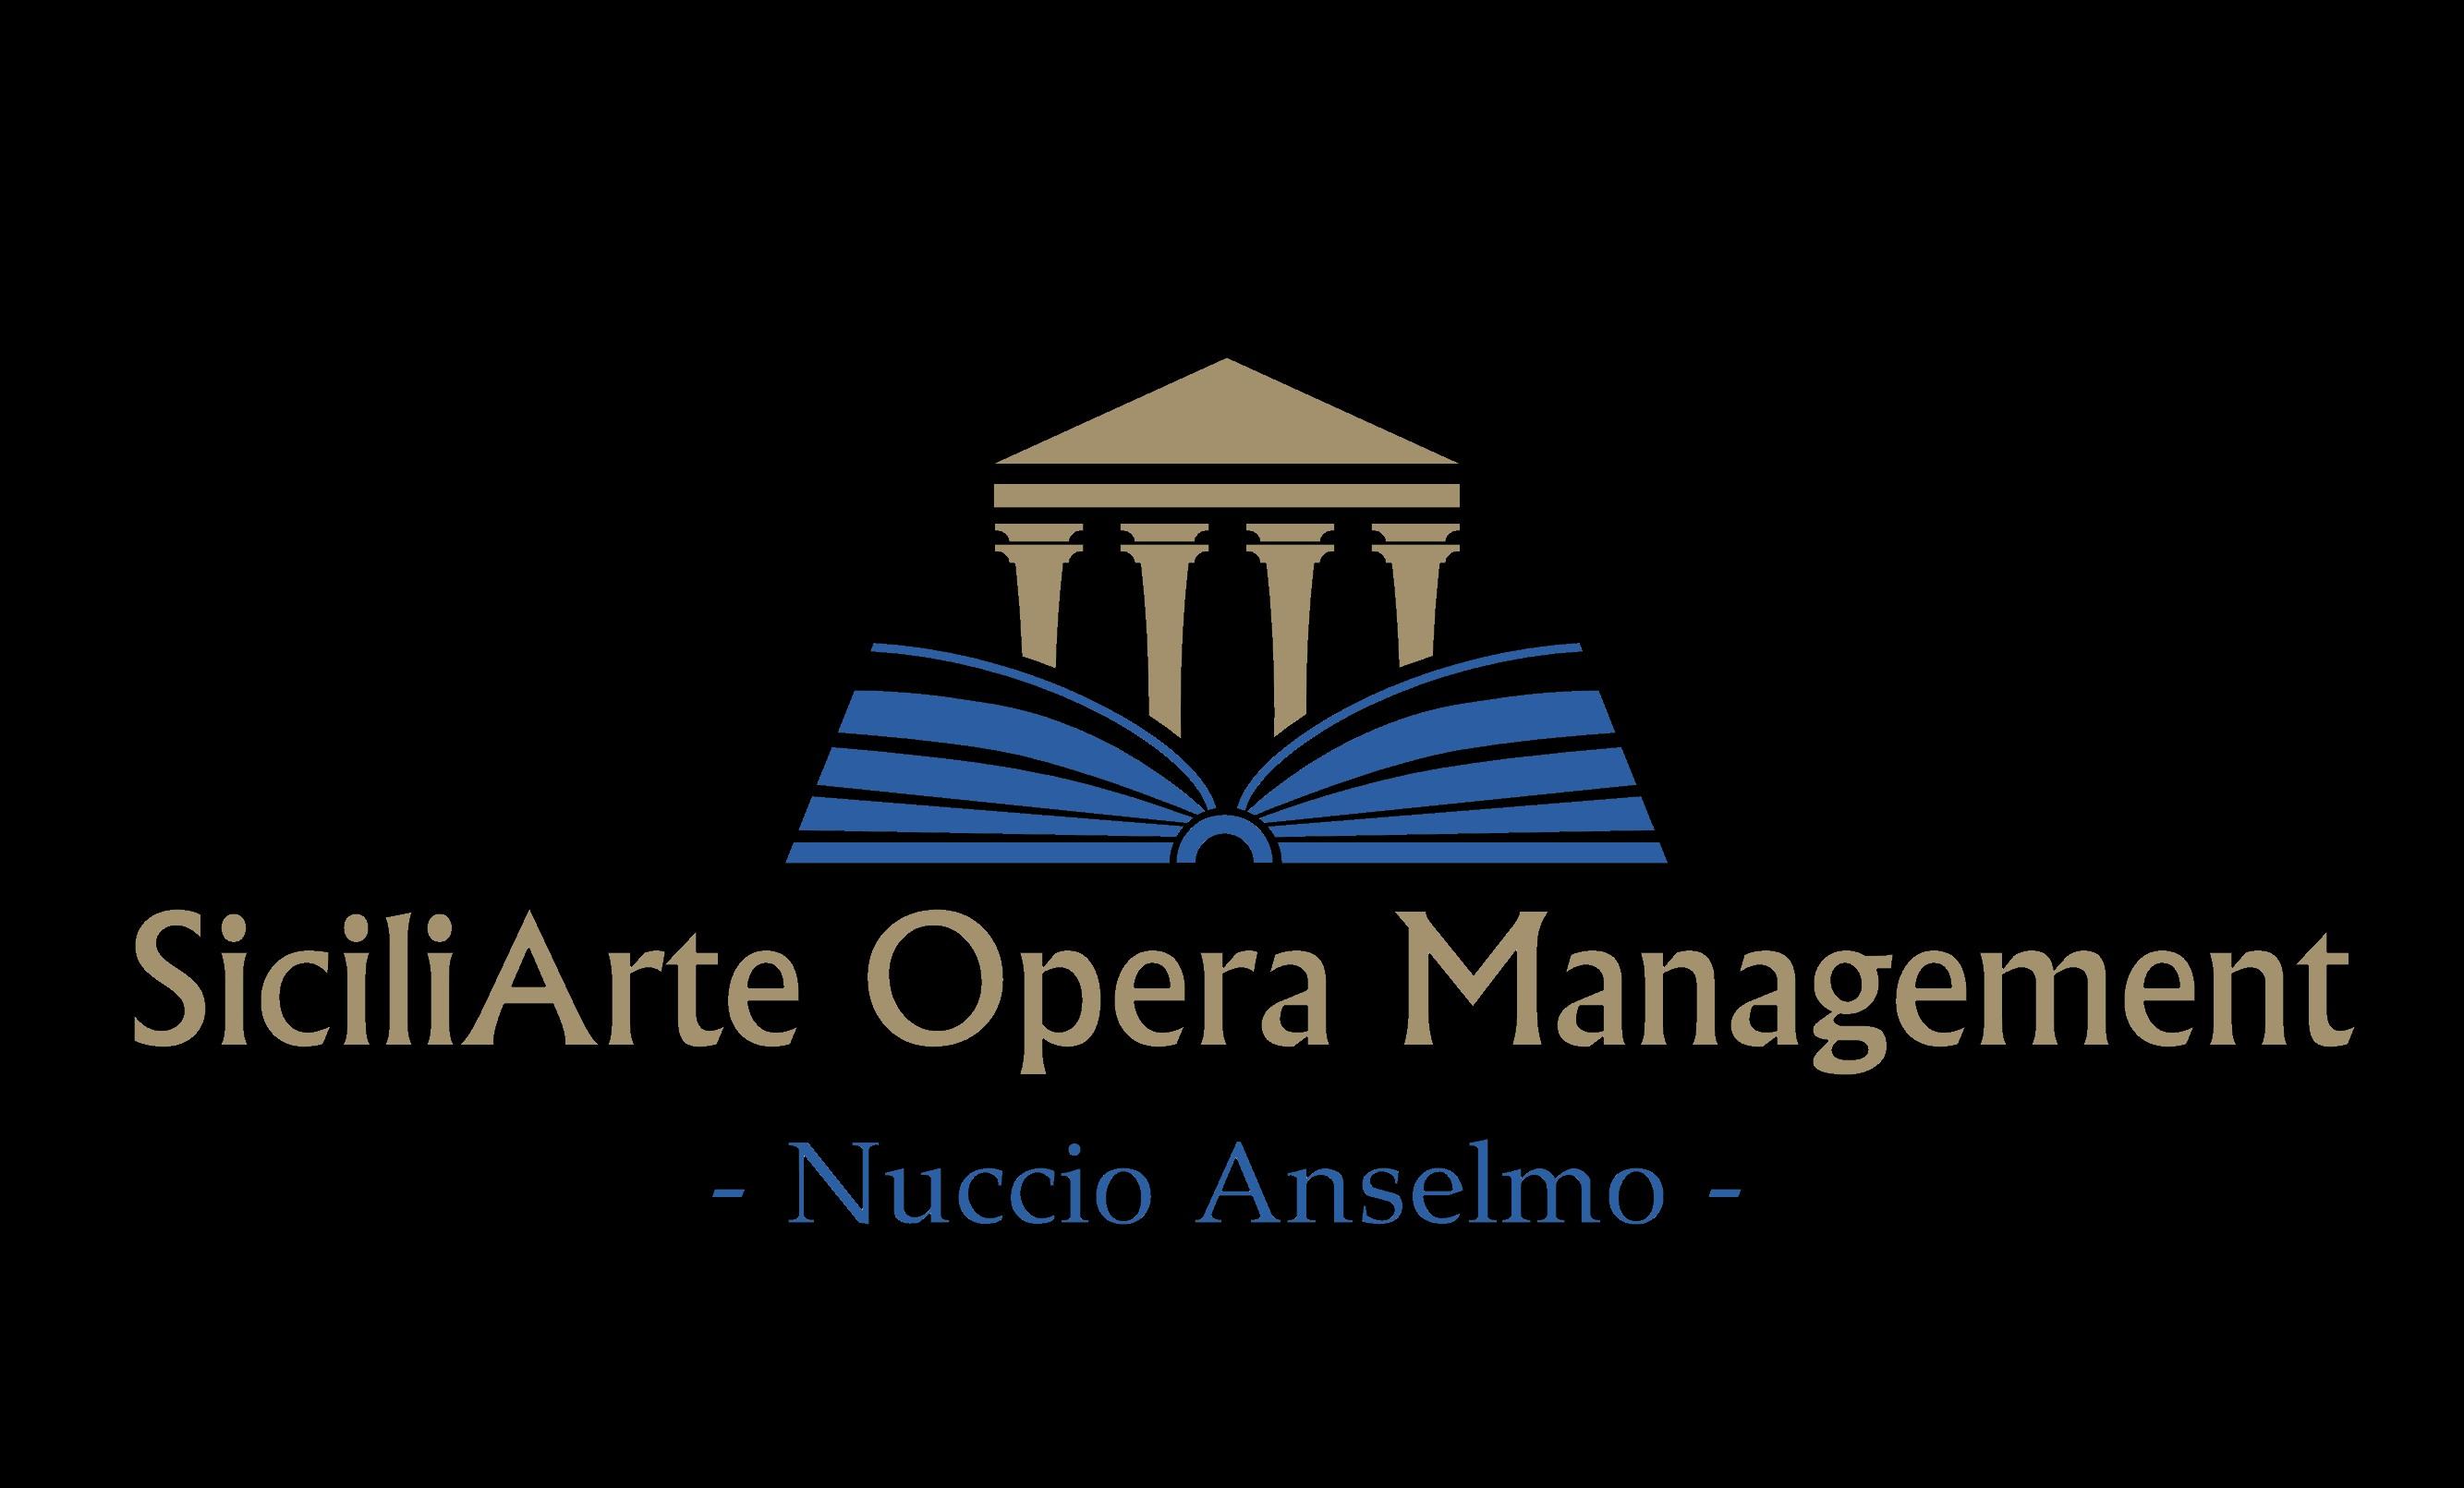 SiciliArte Opera Management